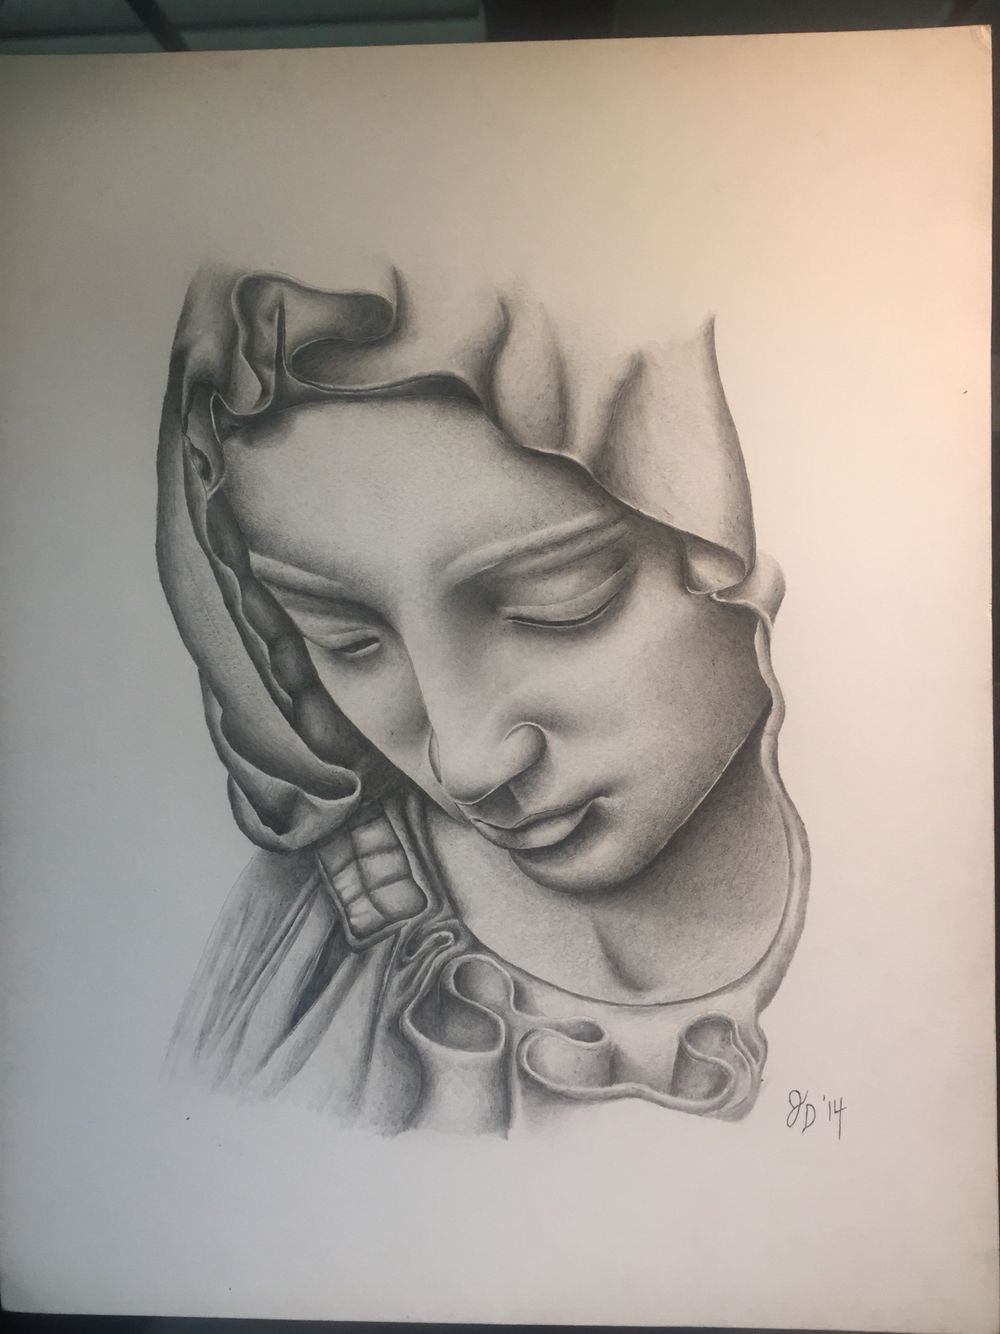 Virgin Mary done in acrylic pencil | My Art | Pinterest ...